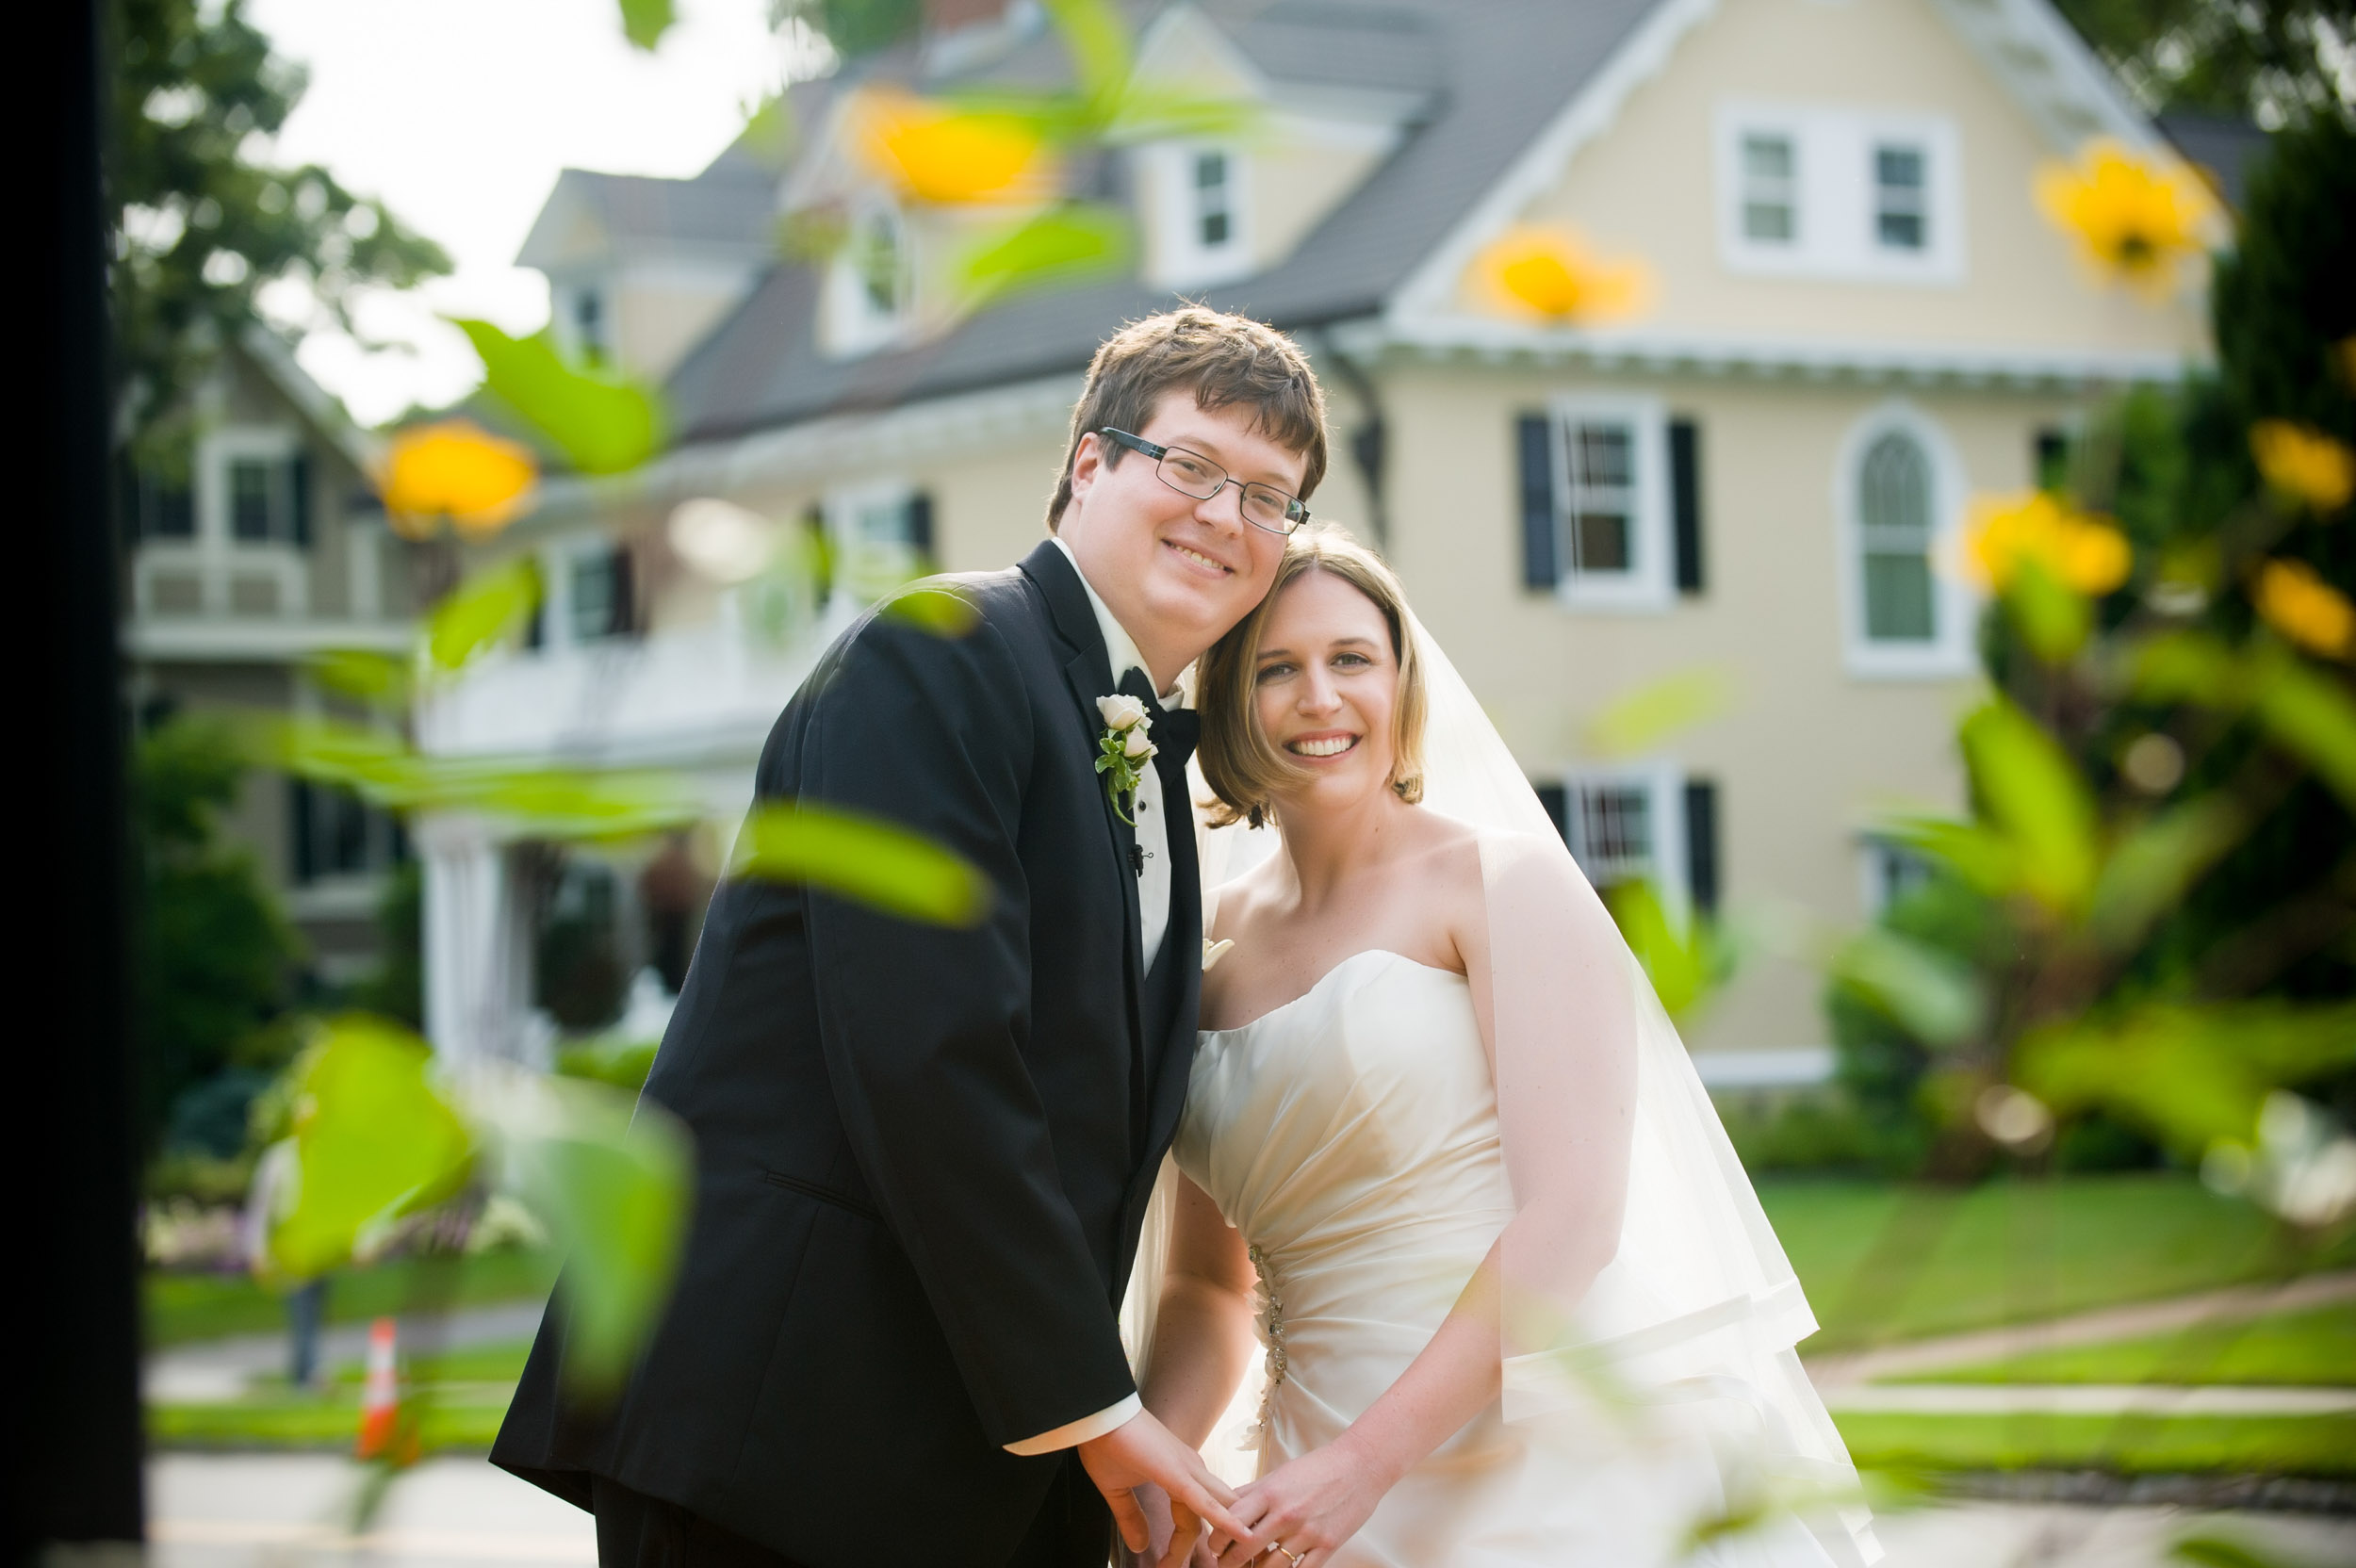 Wedding91KateTim 402*2-Edit-2.jpg